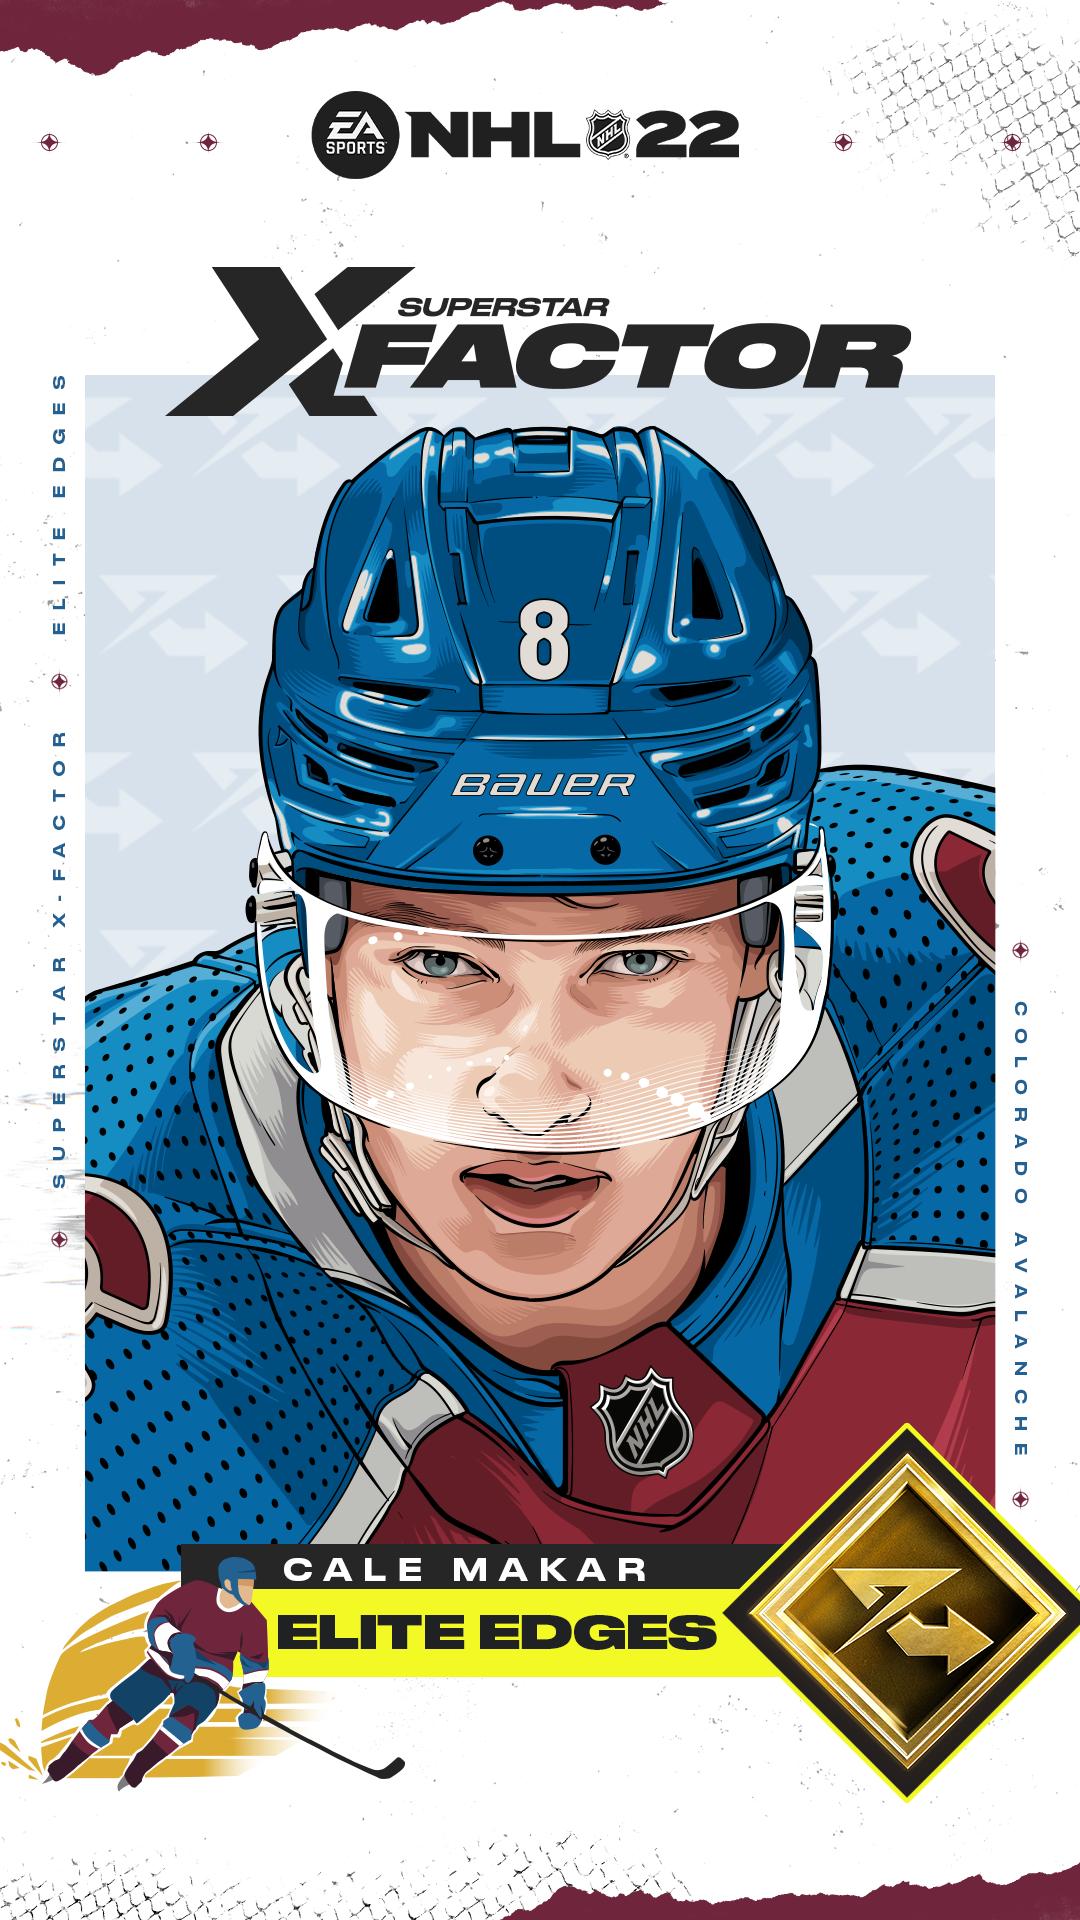 NHL22_XFactor_CaleMakar_9x16